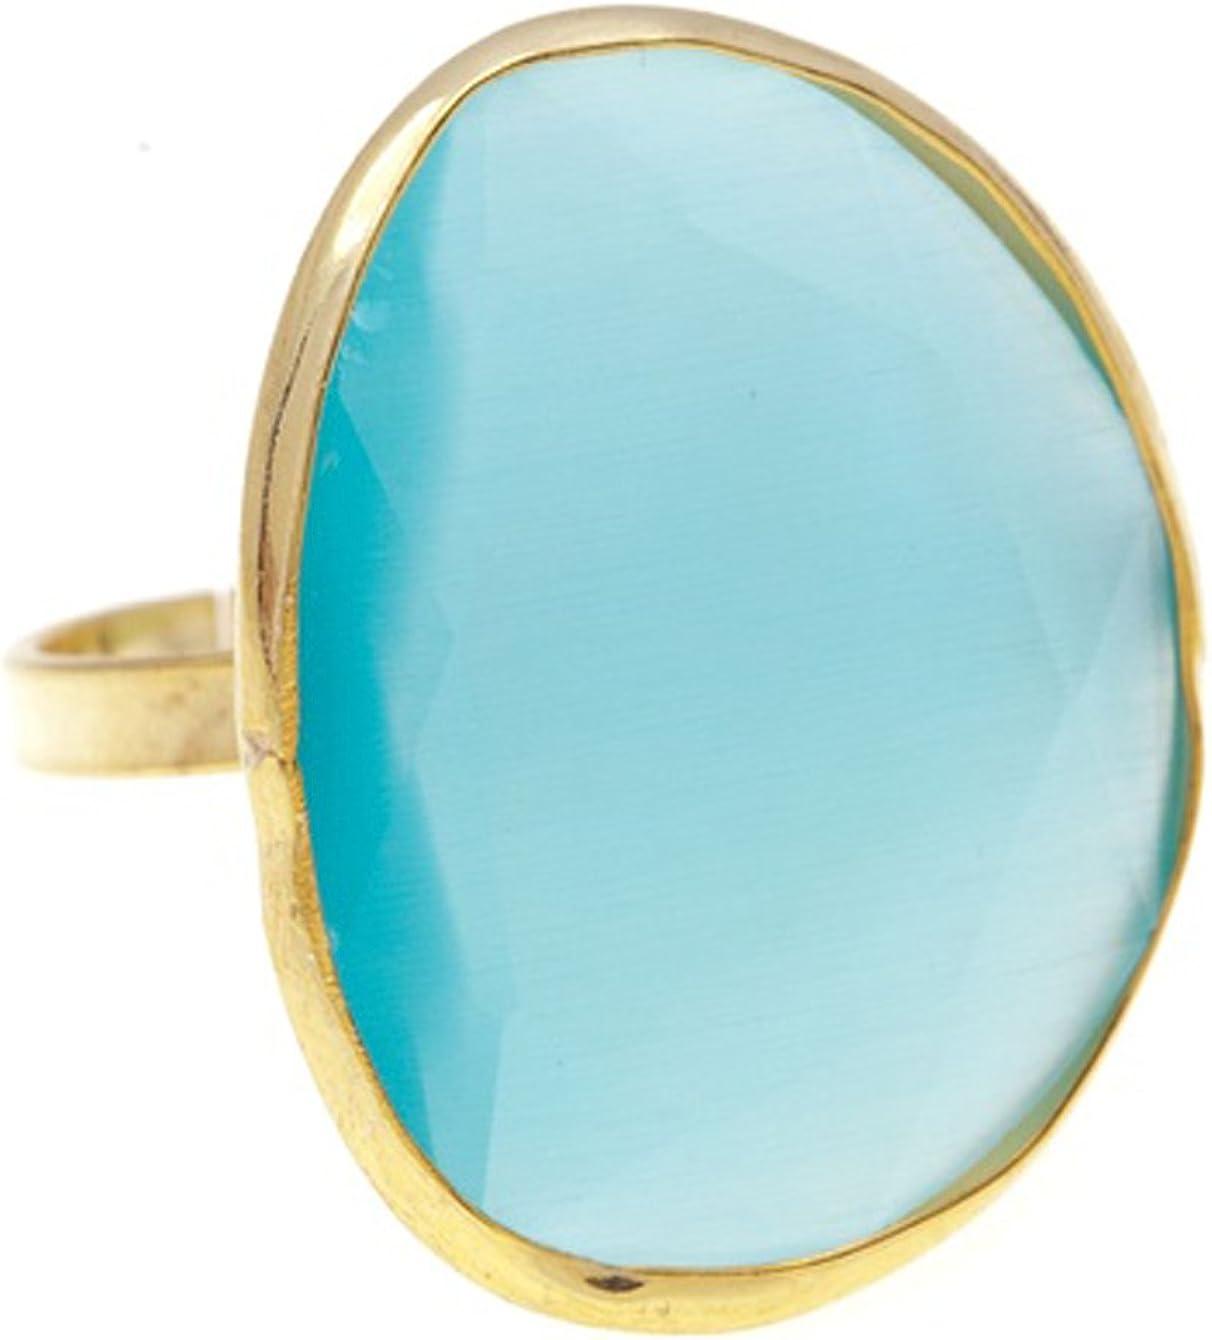 Córdoba Jewels | Anillo en Plata de Ley 925 bañada en Oro. Diseño Elegant Turquesa Oro